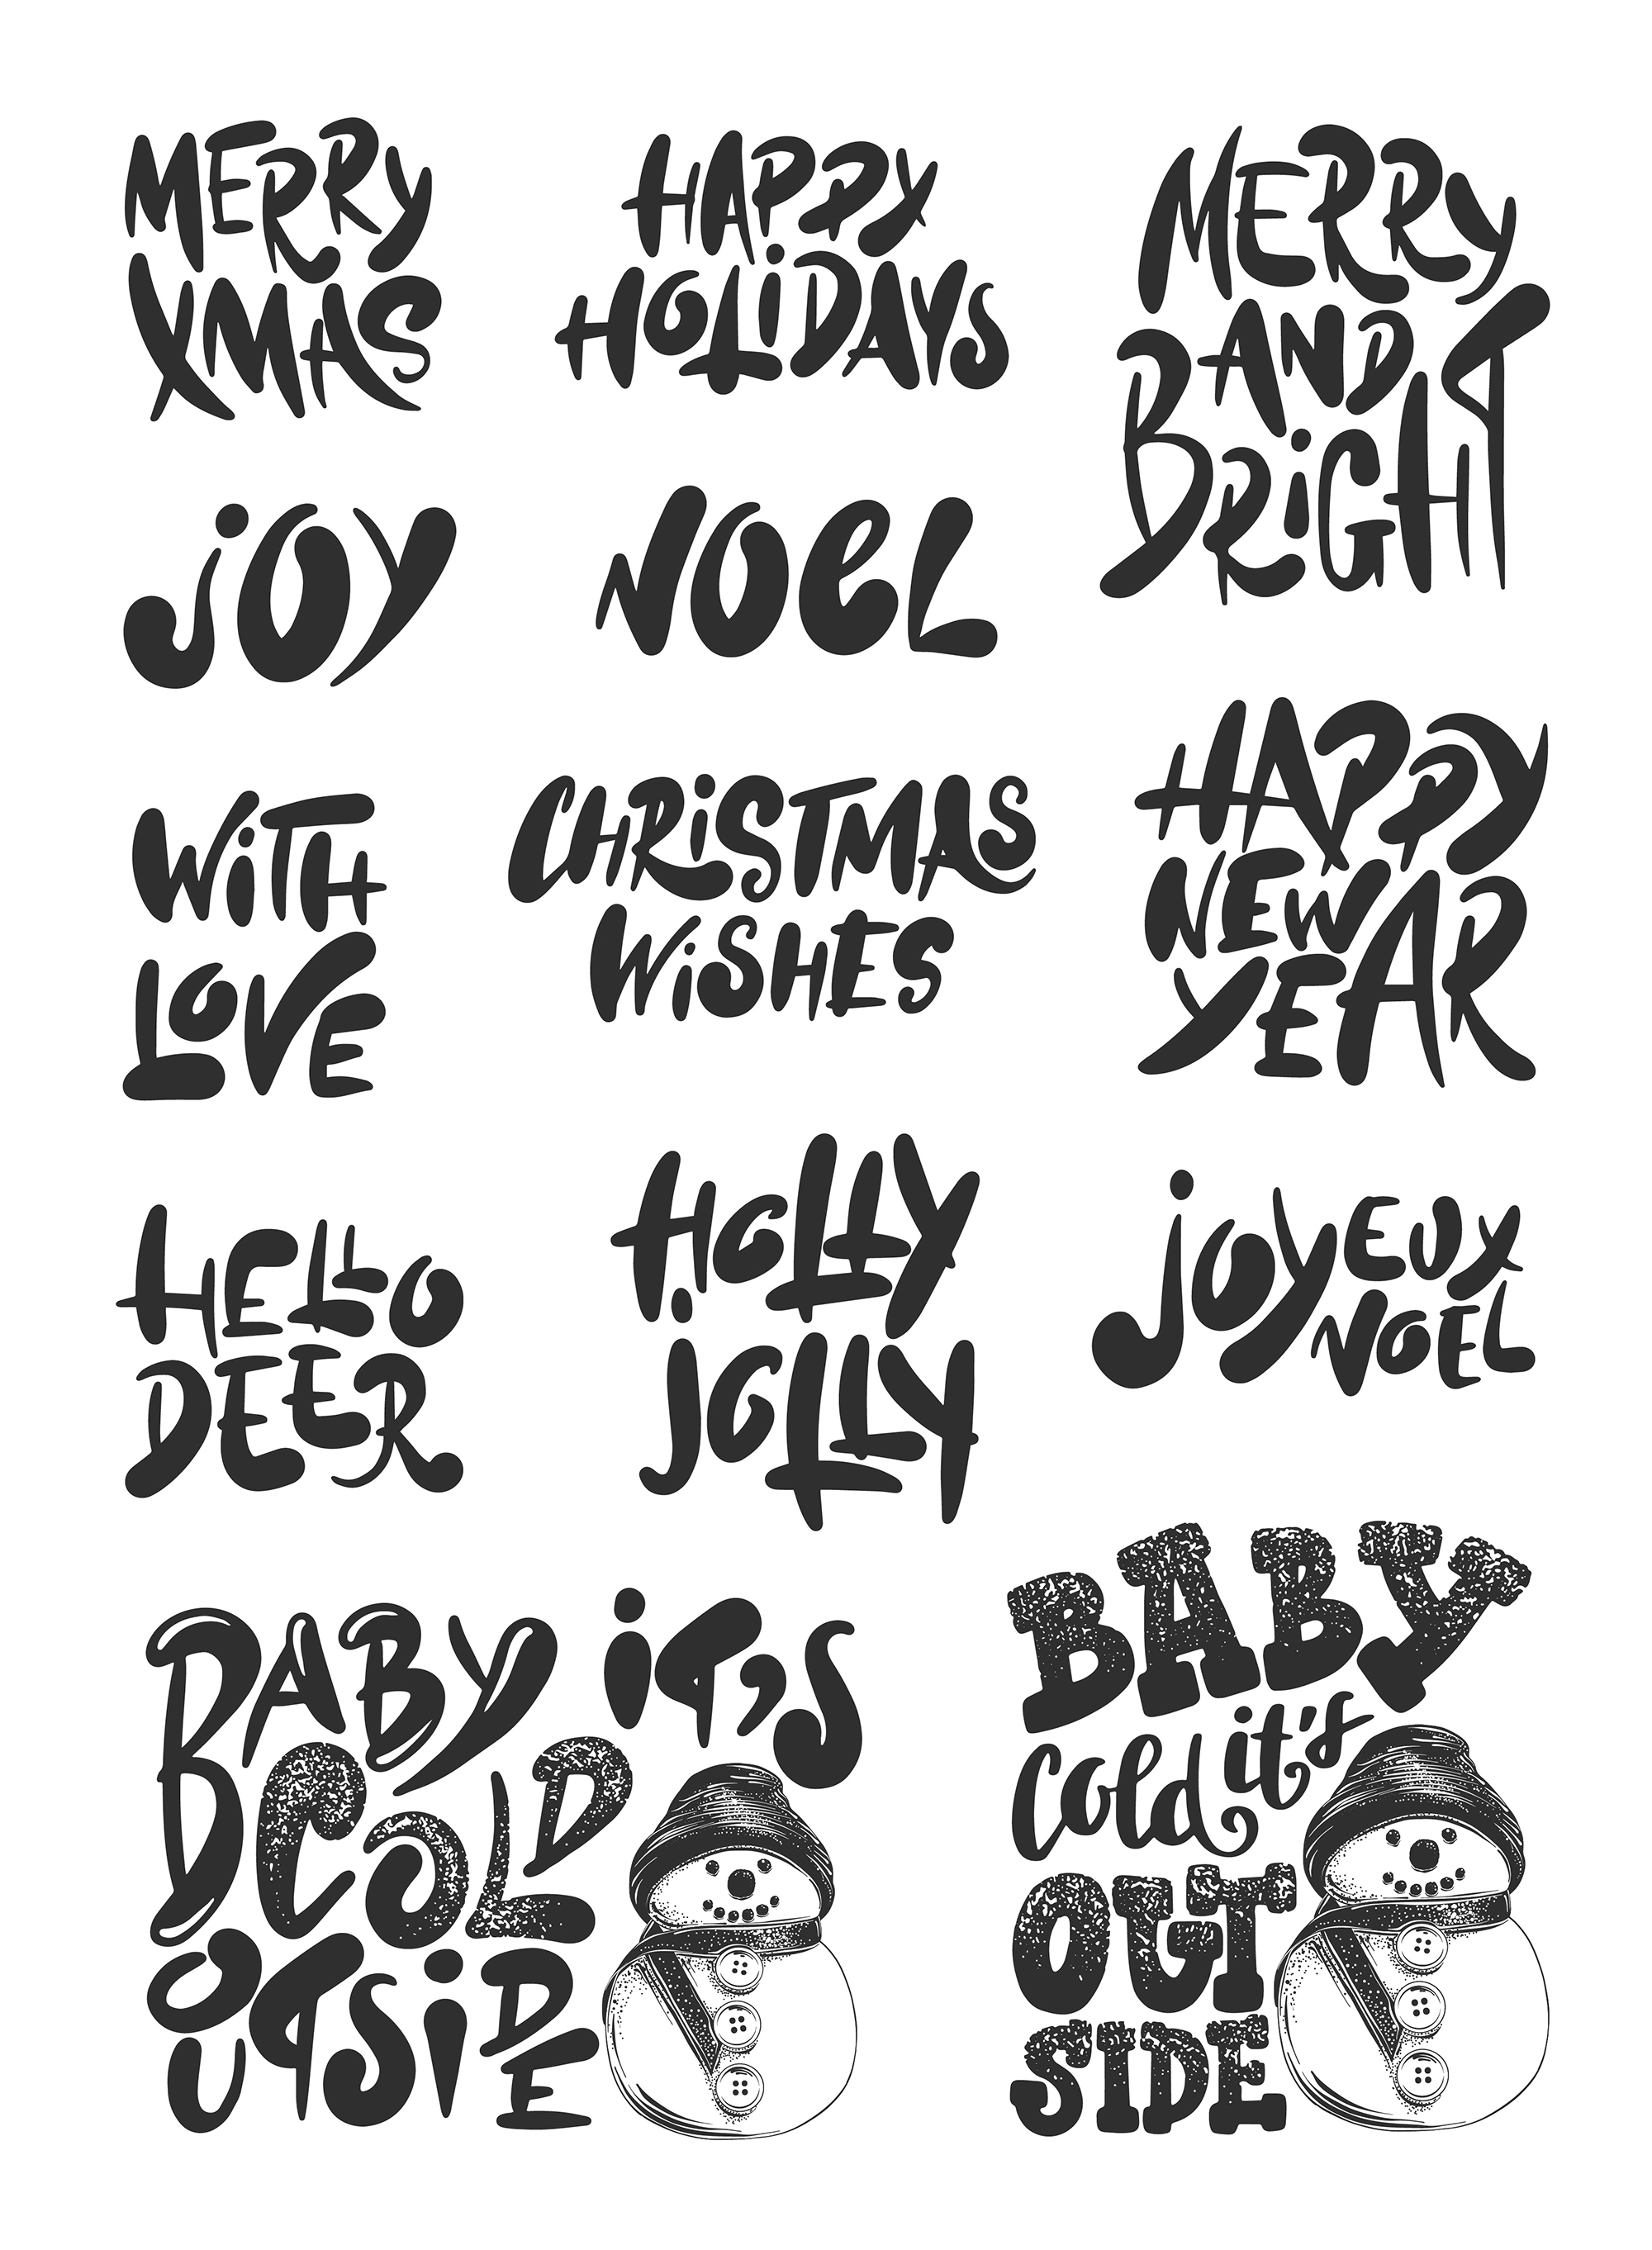 Winter holidays hand drawn art set example image 2